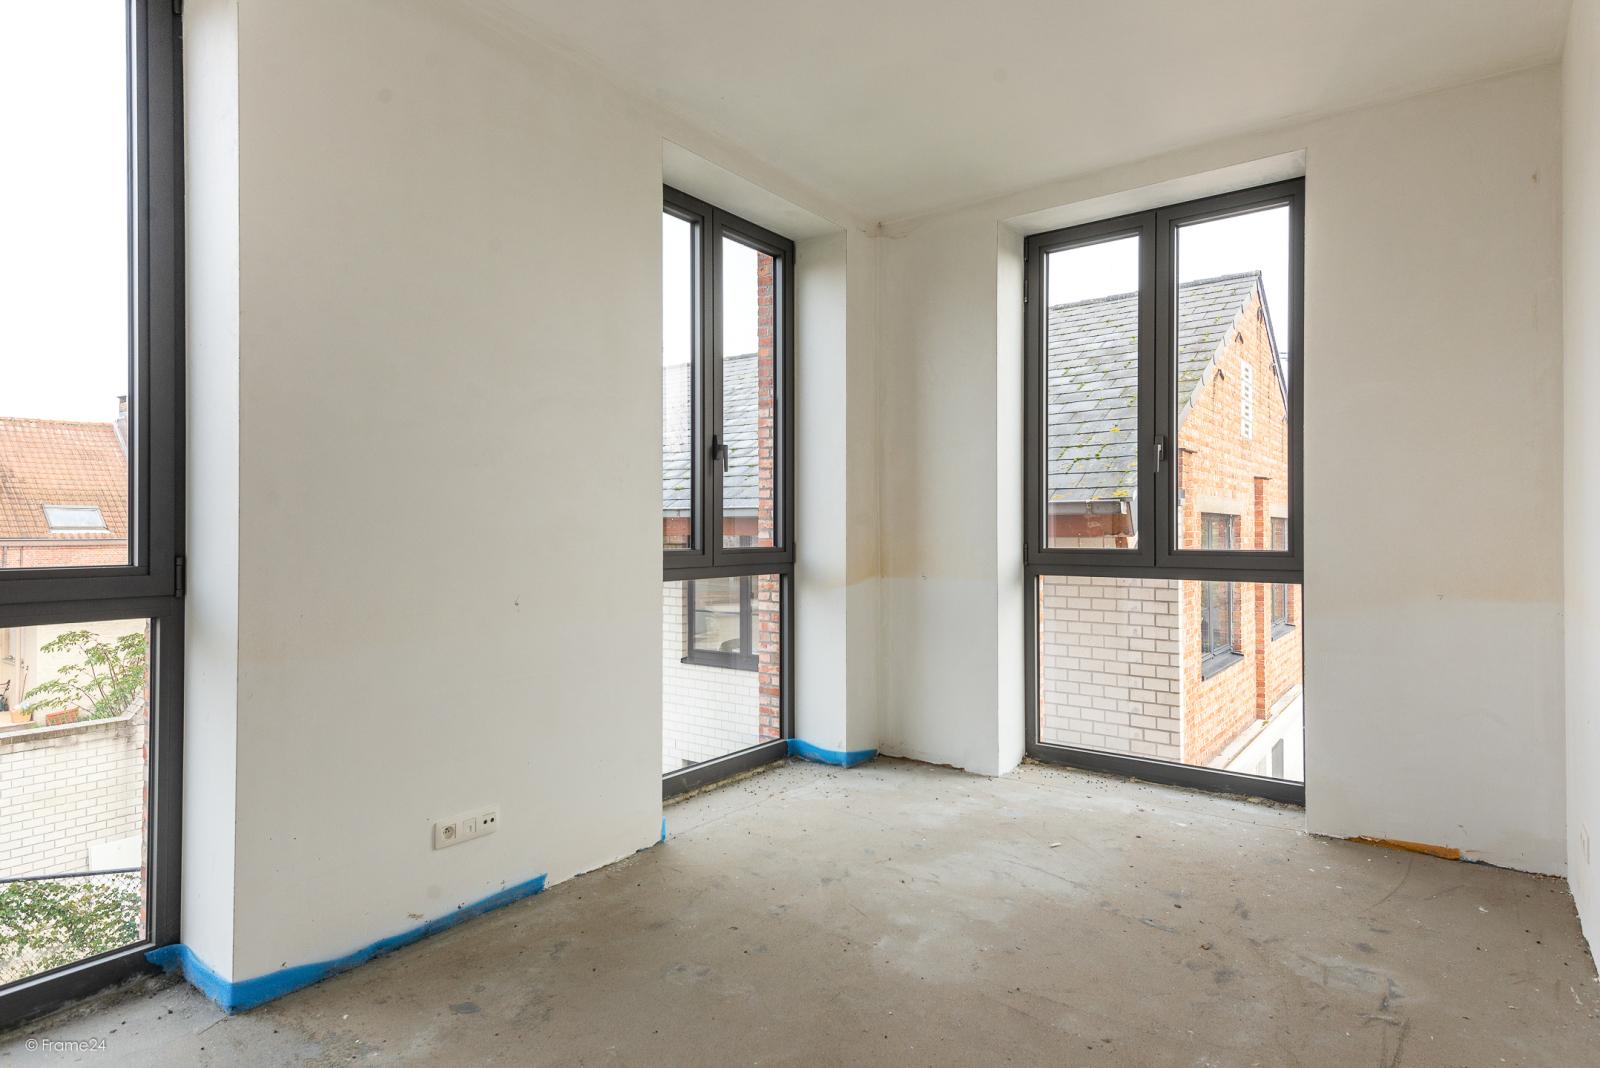 Riant vernieuwd appartement (147 m²) op centrale ligging te Walem! afbeelding 7